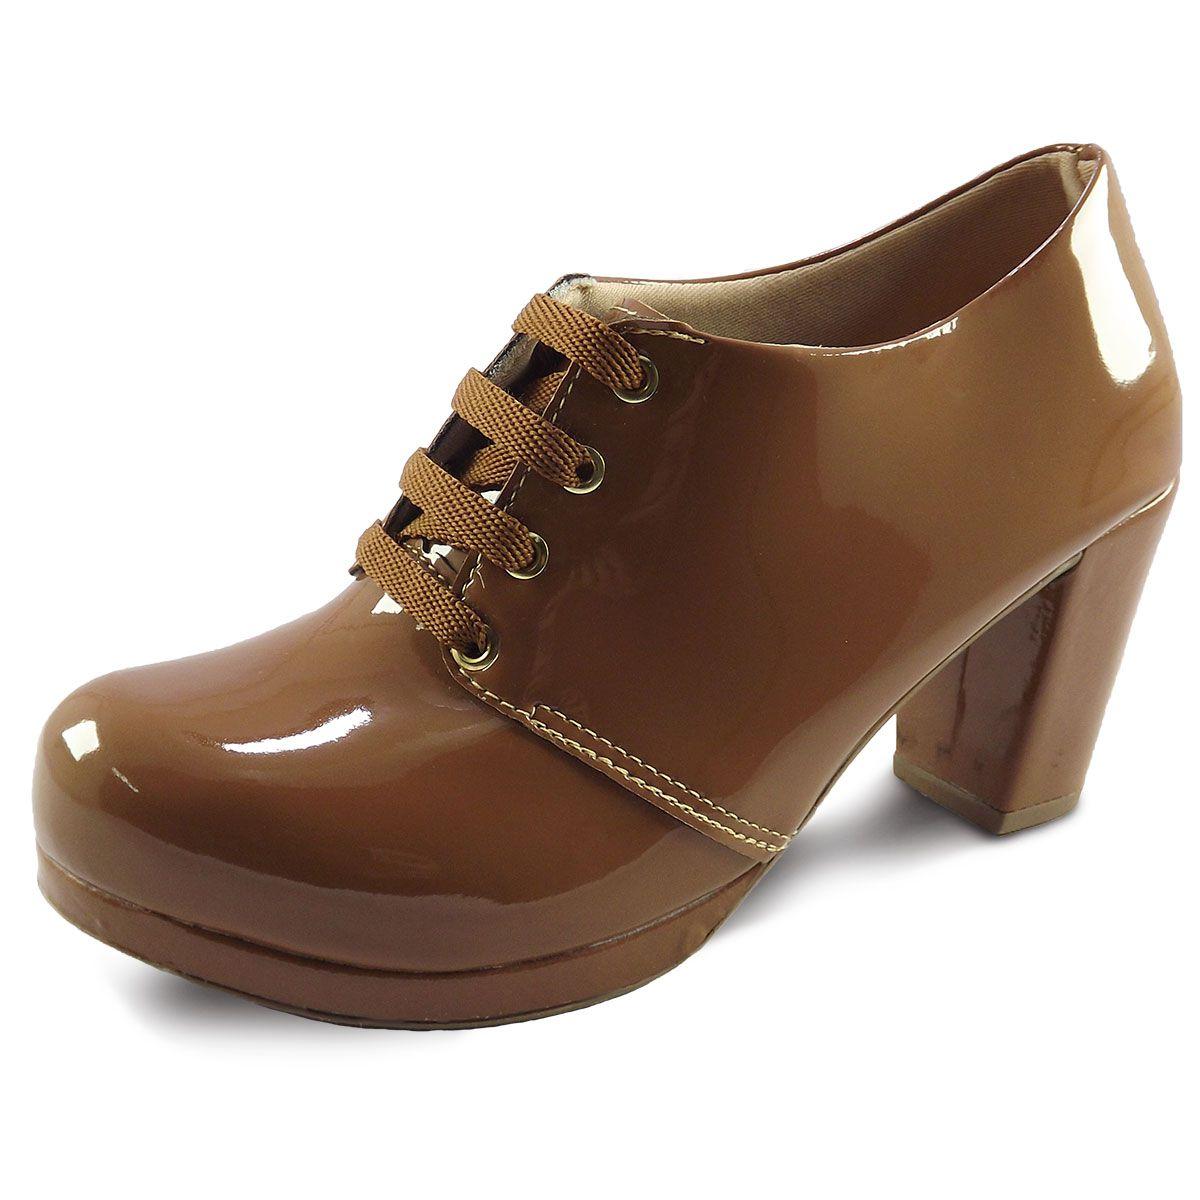 86eea057f6 Sapato Oxford Feminino Tratorado - Itra Sapato Oxford Feminino Tratorado -  Itra ...